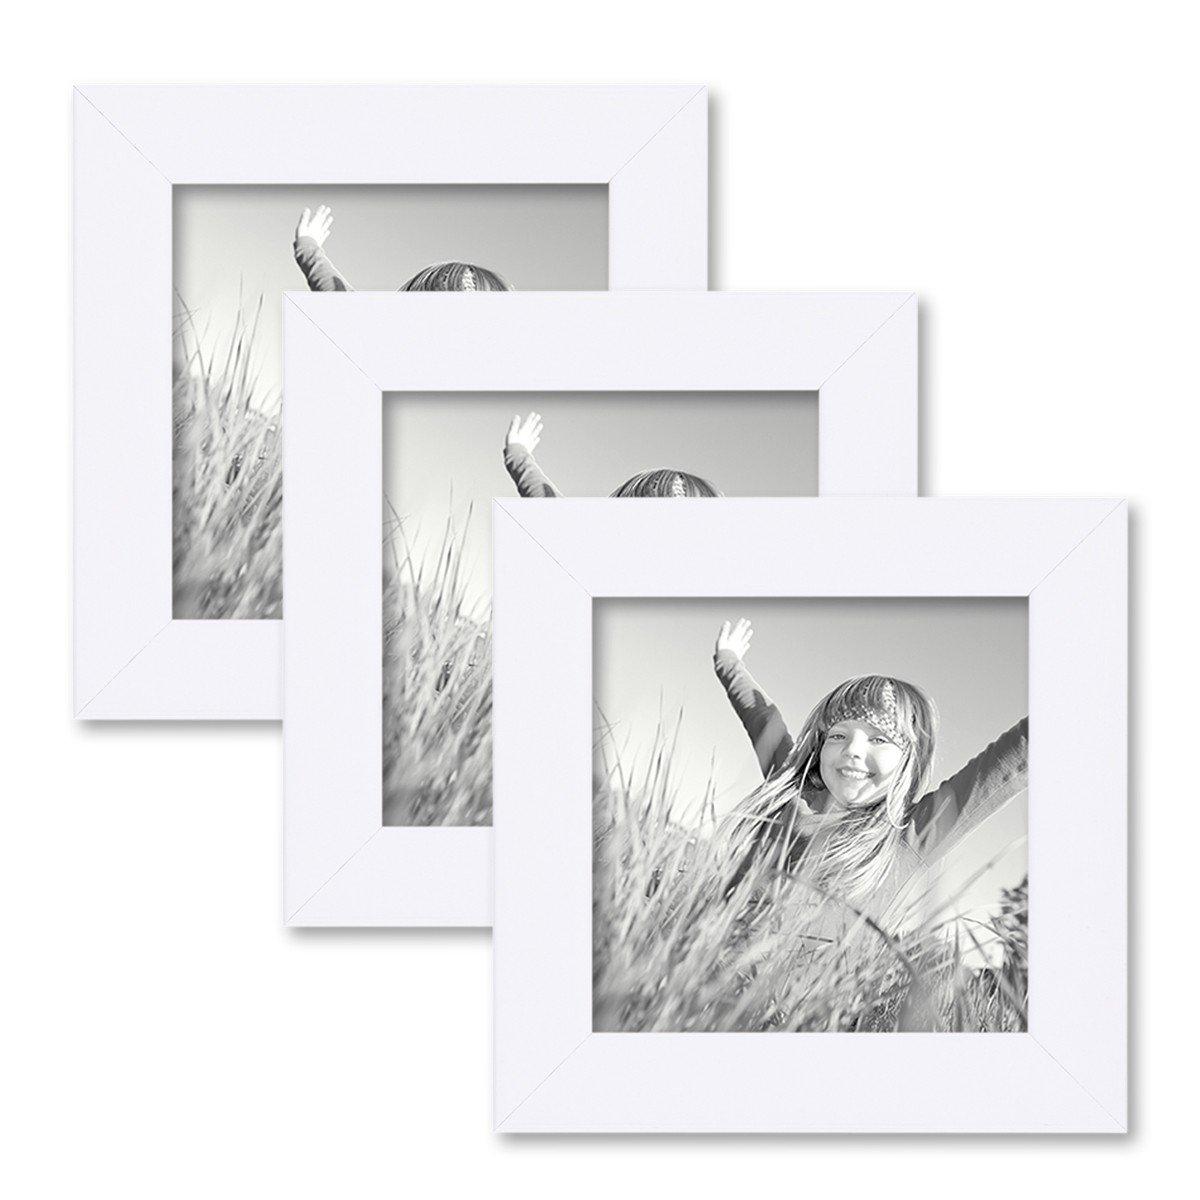 Amazon.de: PHOTOLINI 3er Set Bilderrahmen 10x10 cm Weiss Modern aus ...